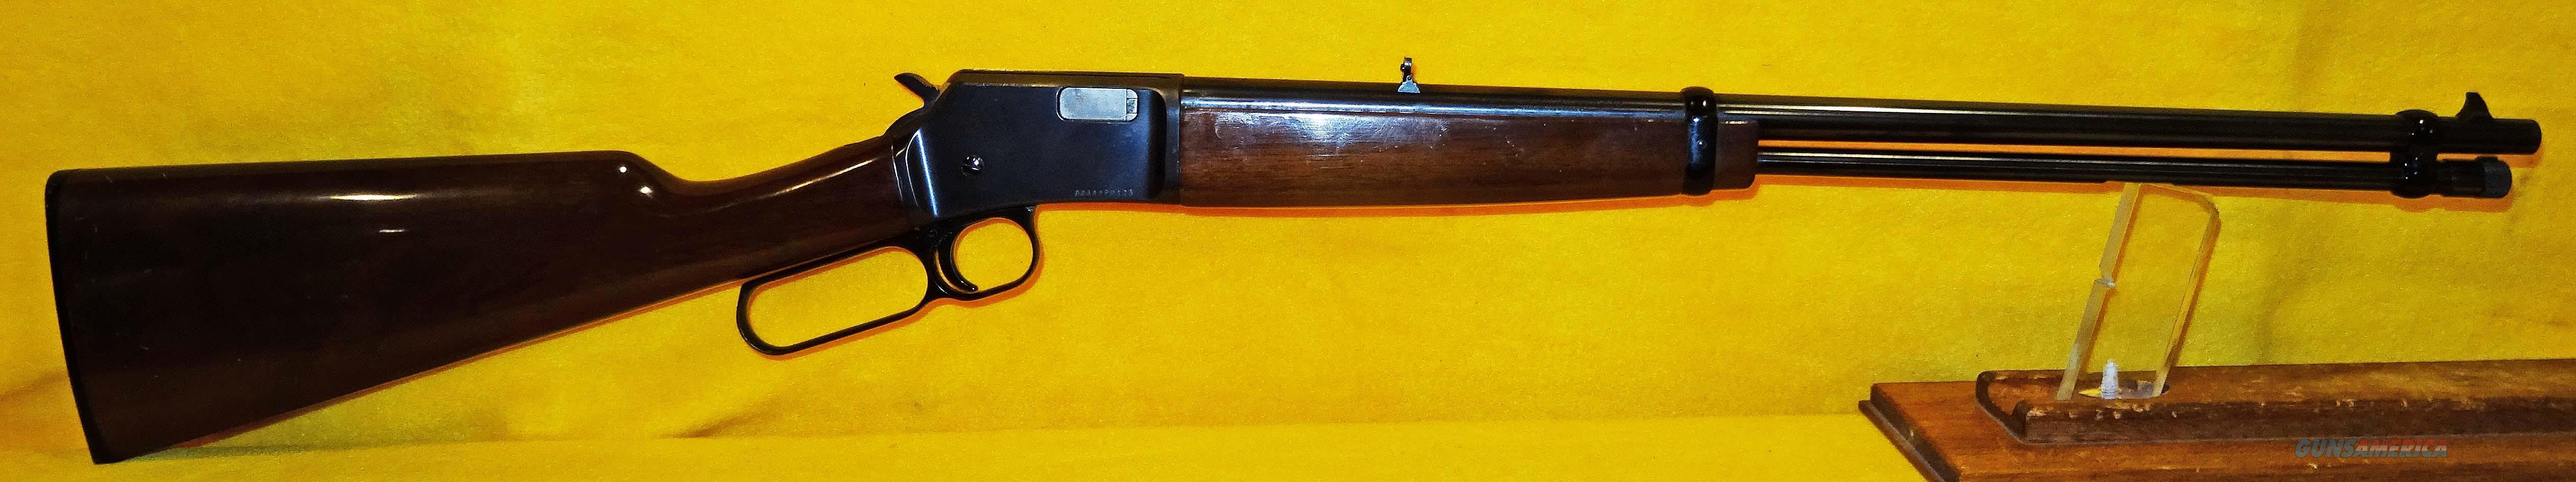 BROWNING BL-22  Guns > Rifles > Browning Rifles > Lever Action